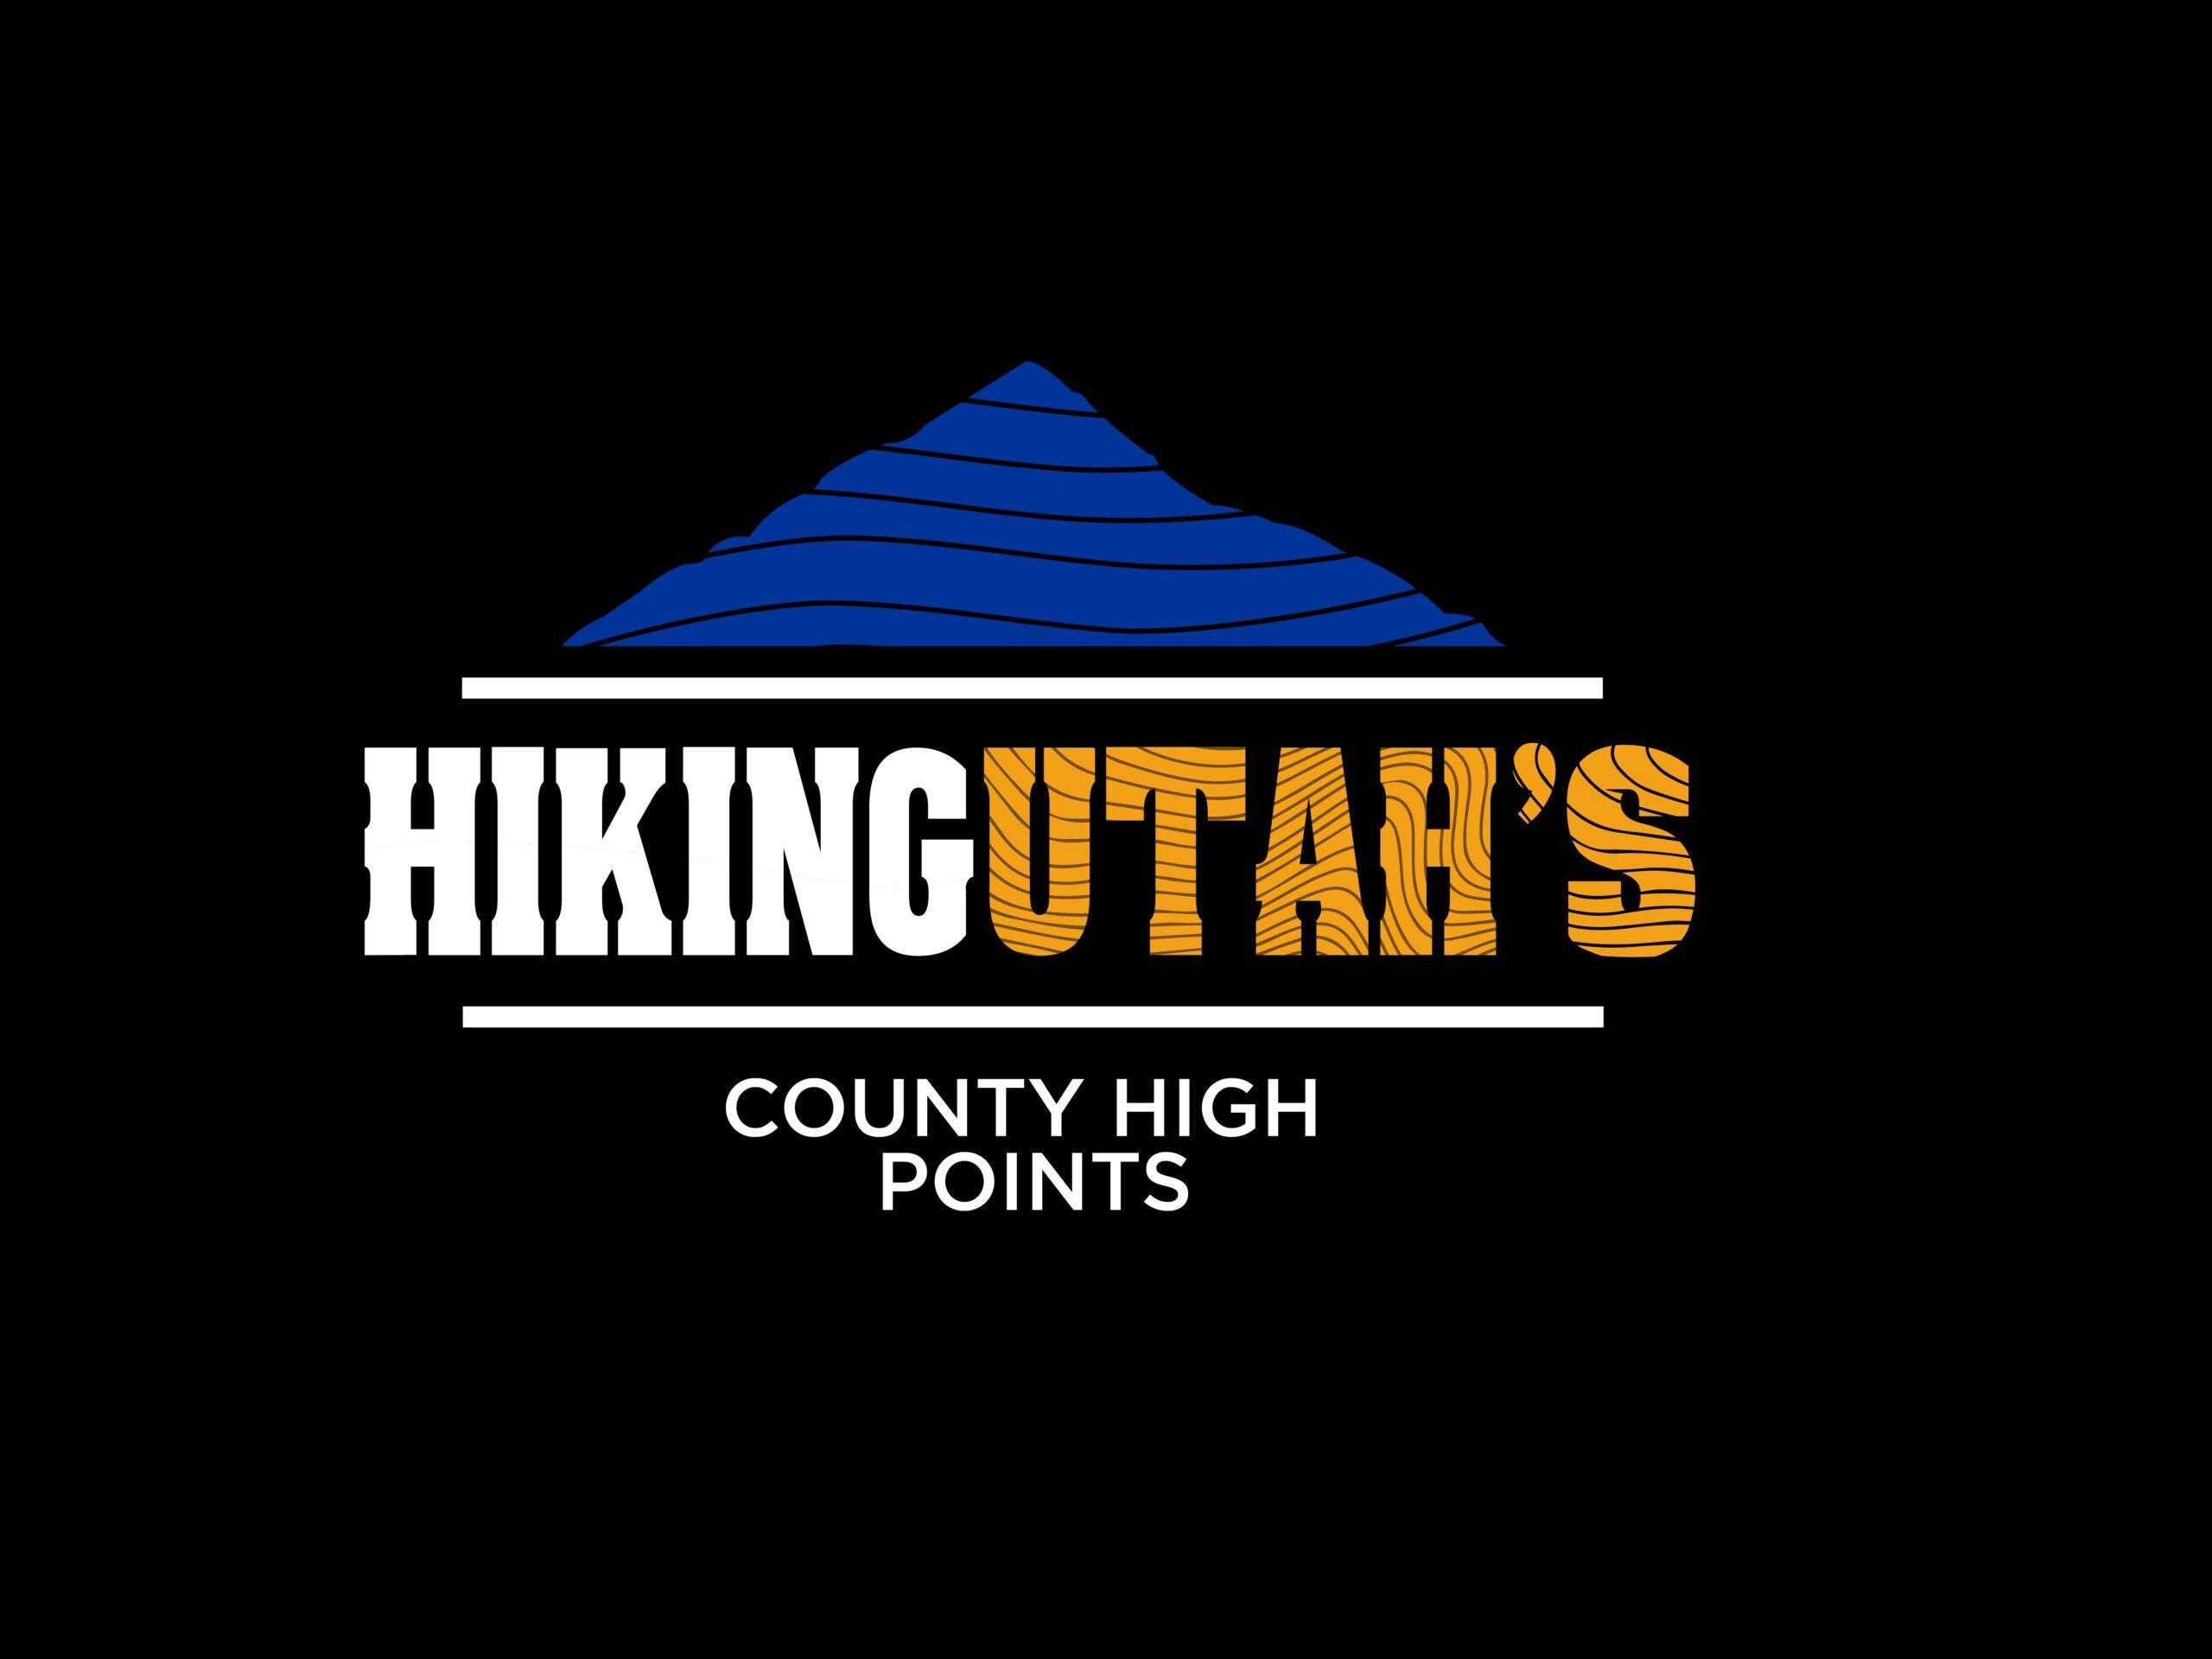 Utah County High Points